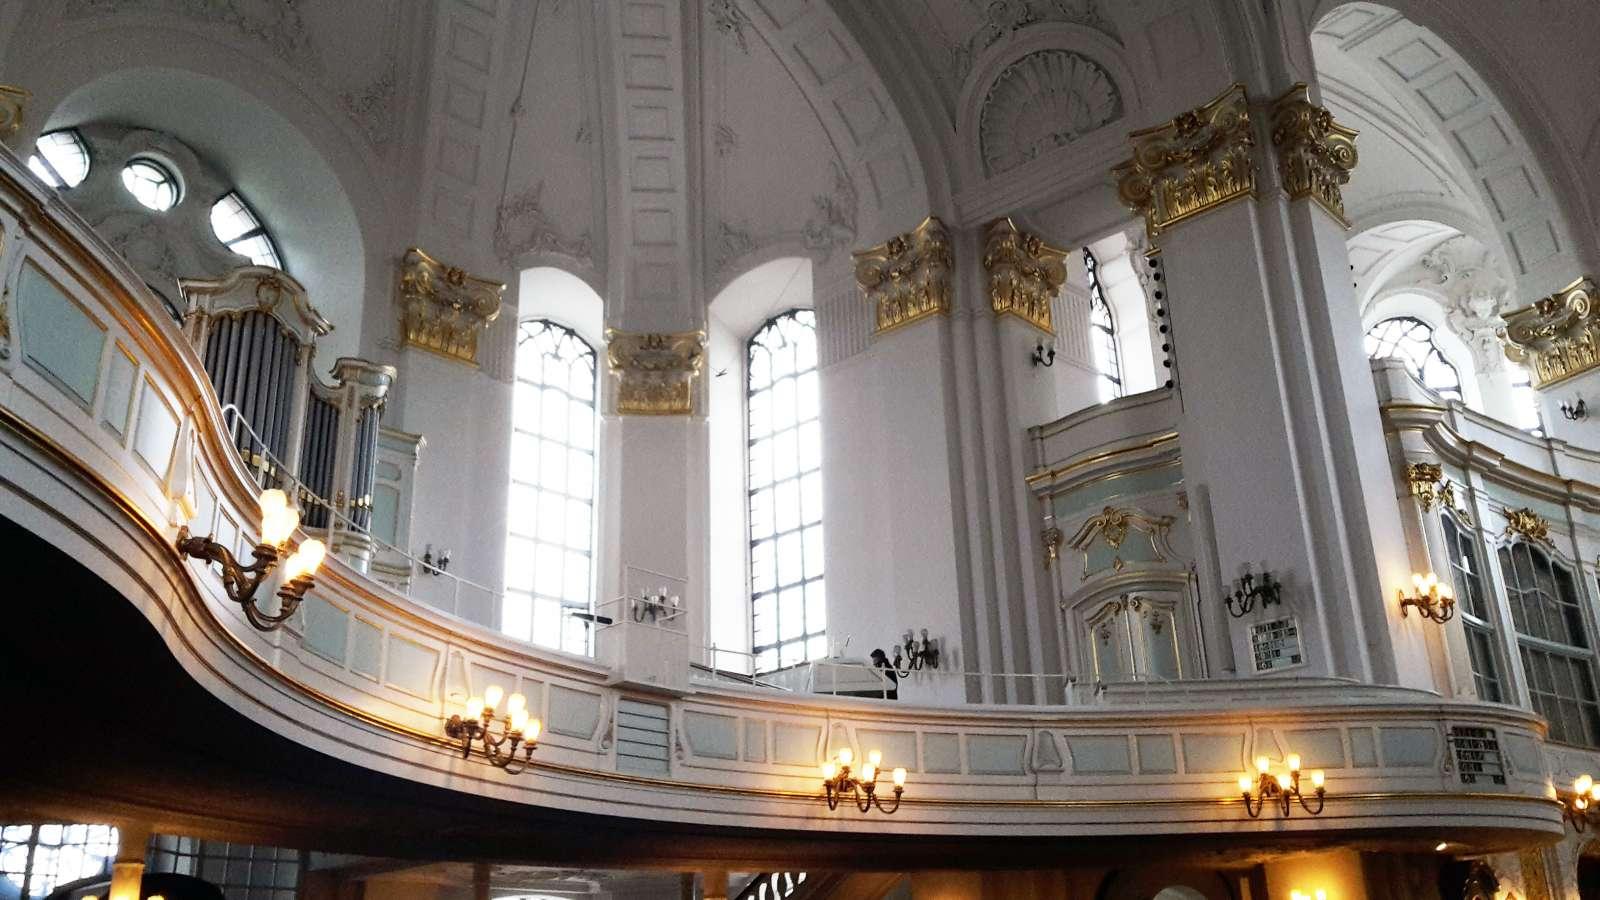 Der geschwungene, barocke Innenraum des Michels